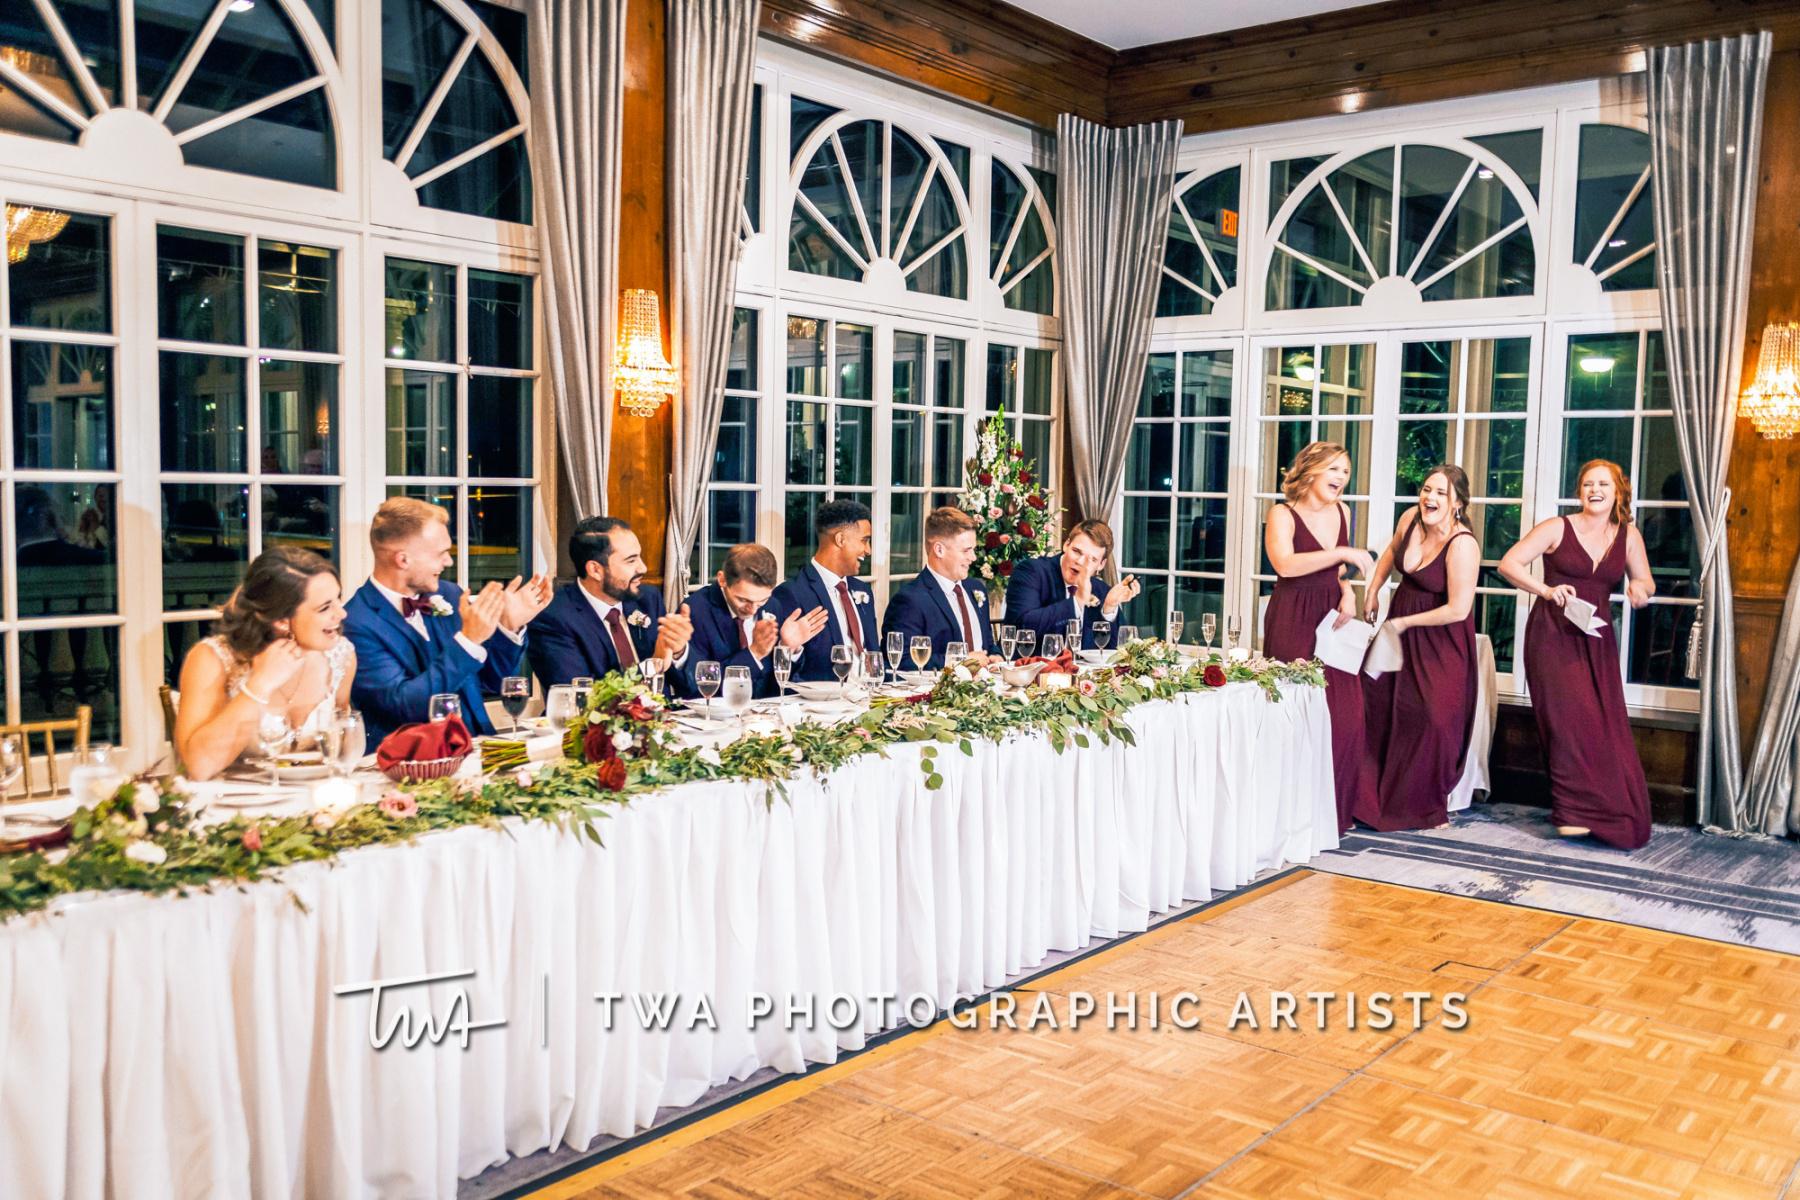 Chicago-Wedding-Photographer-TWA-Photographic-Artists-063_091-1280